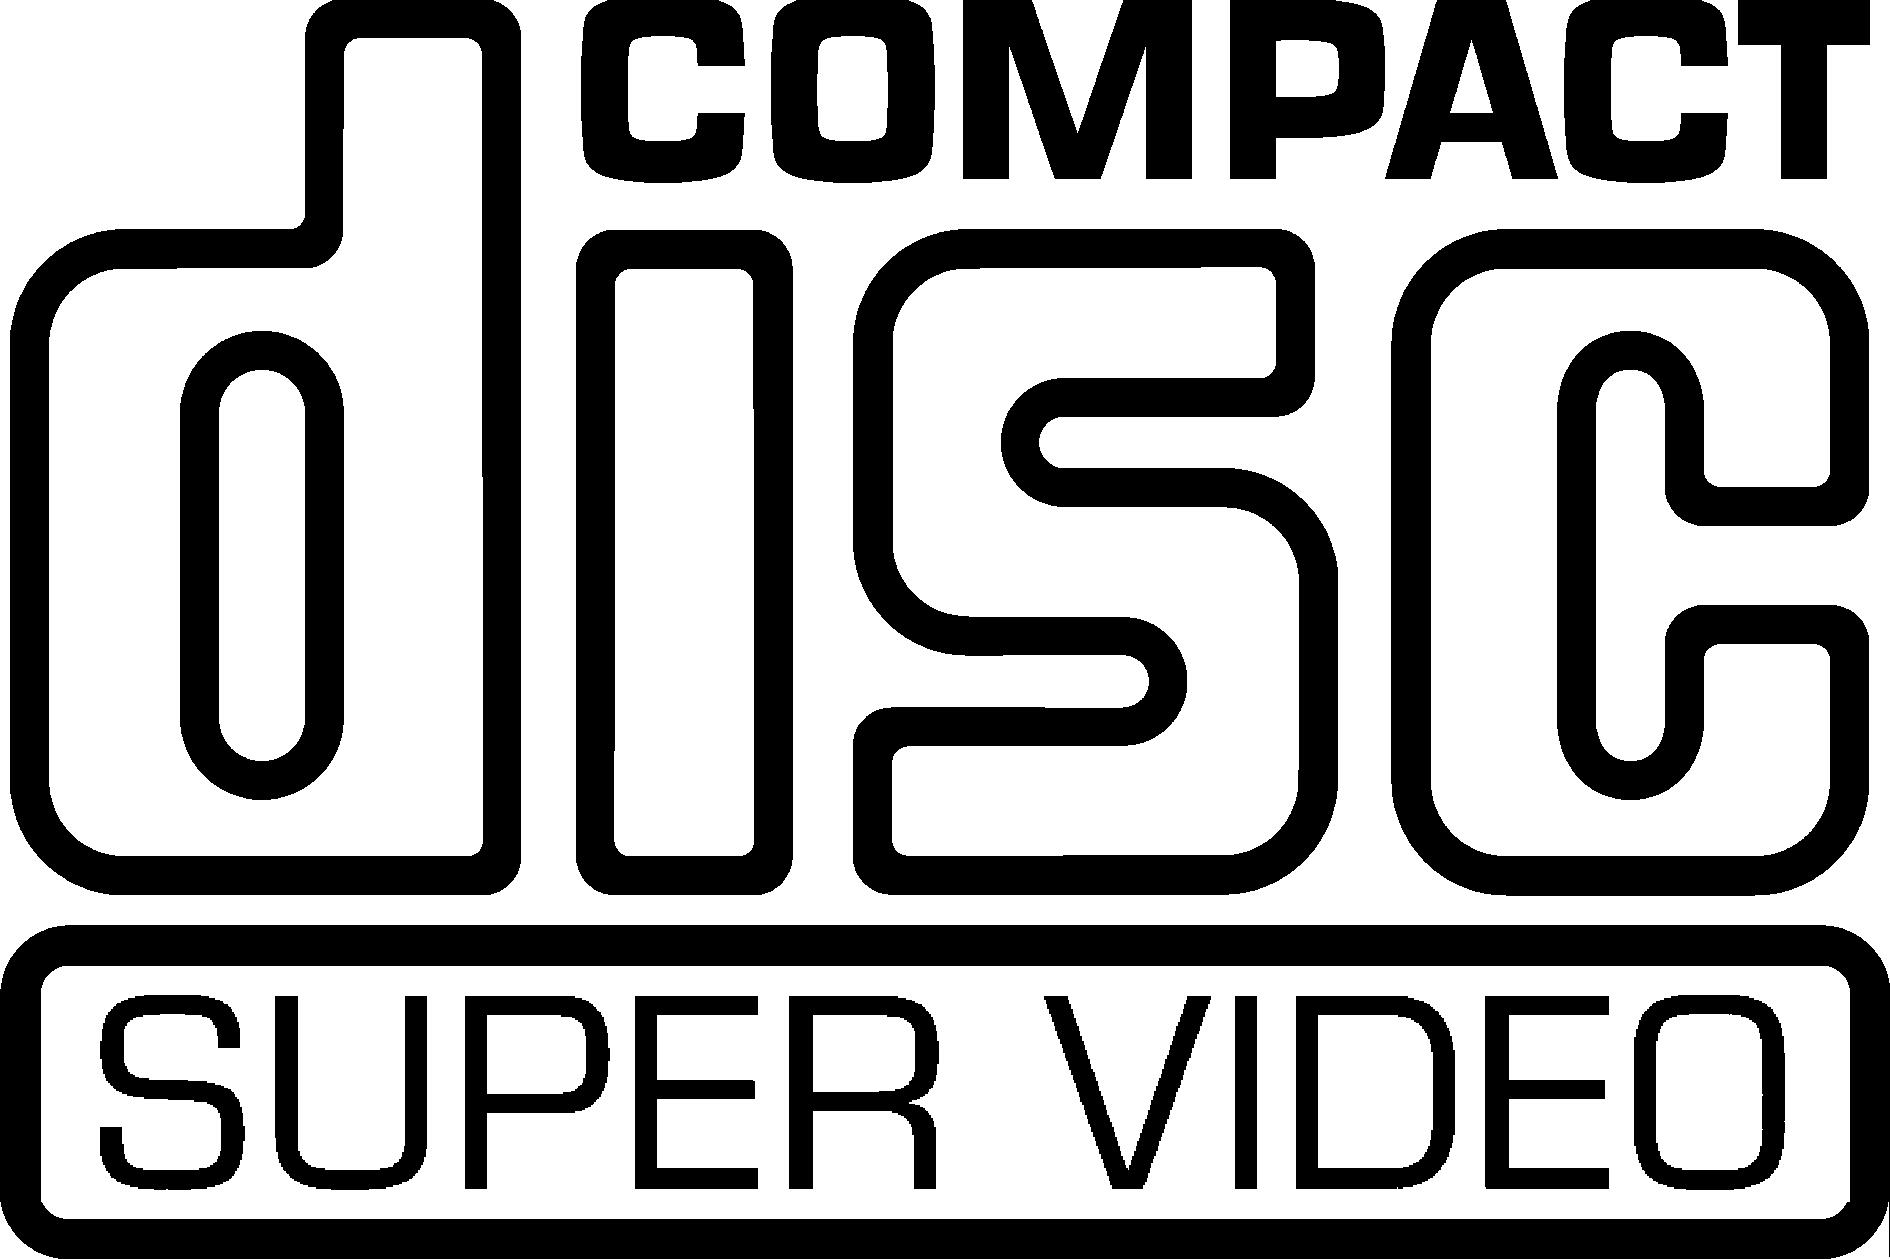 . Hdpng.com Super Video Cd - Compact Disc, Transparent background PNG HD thumbnail